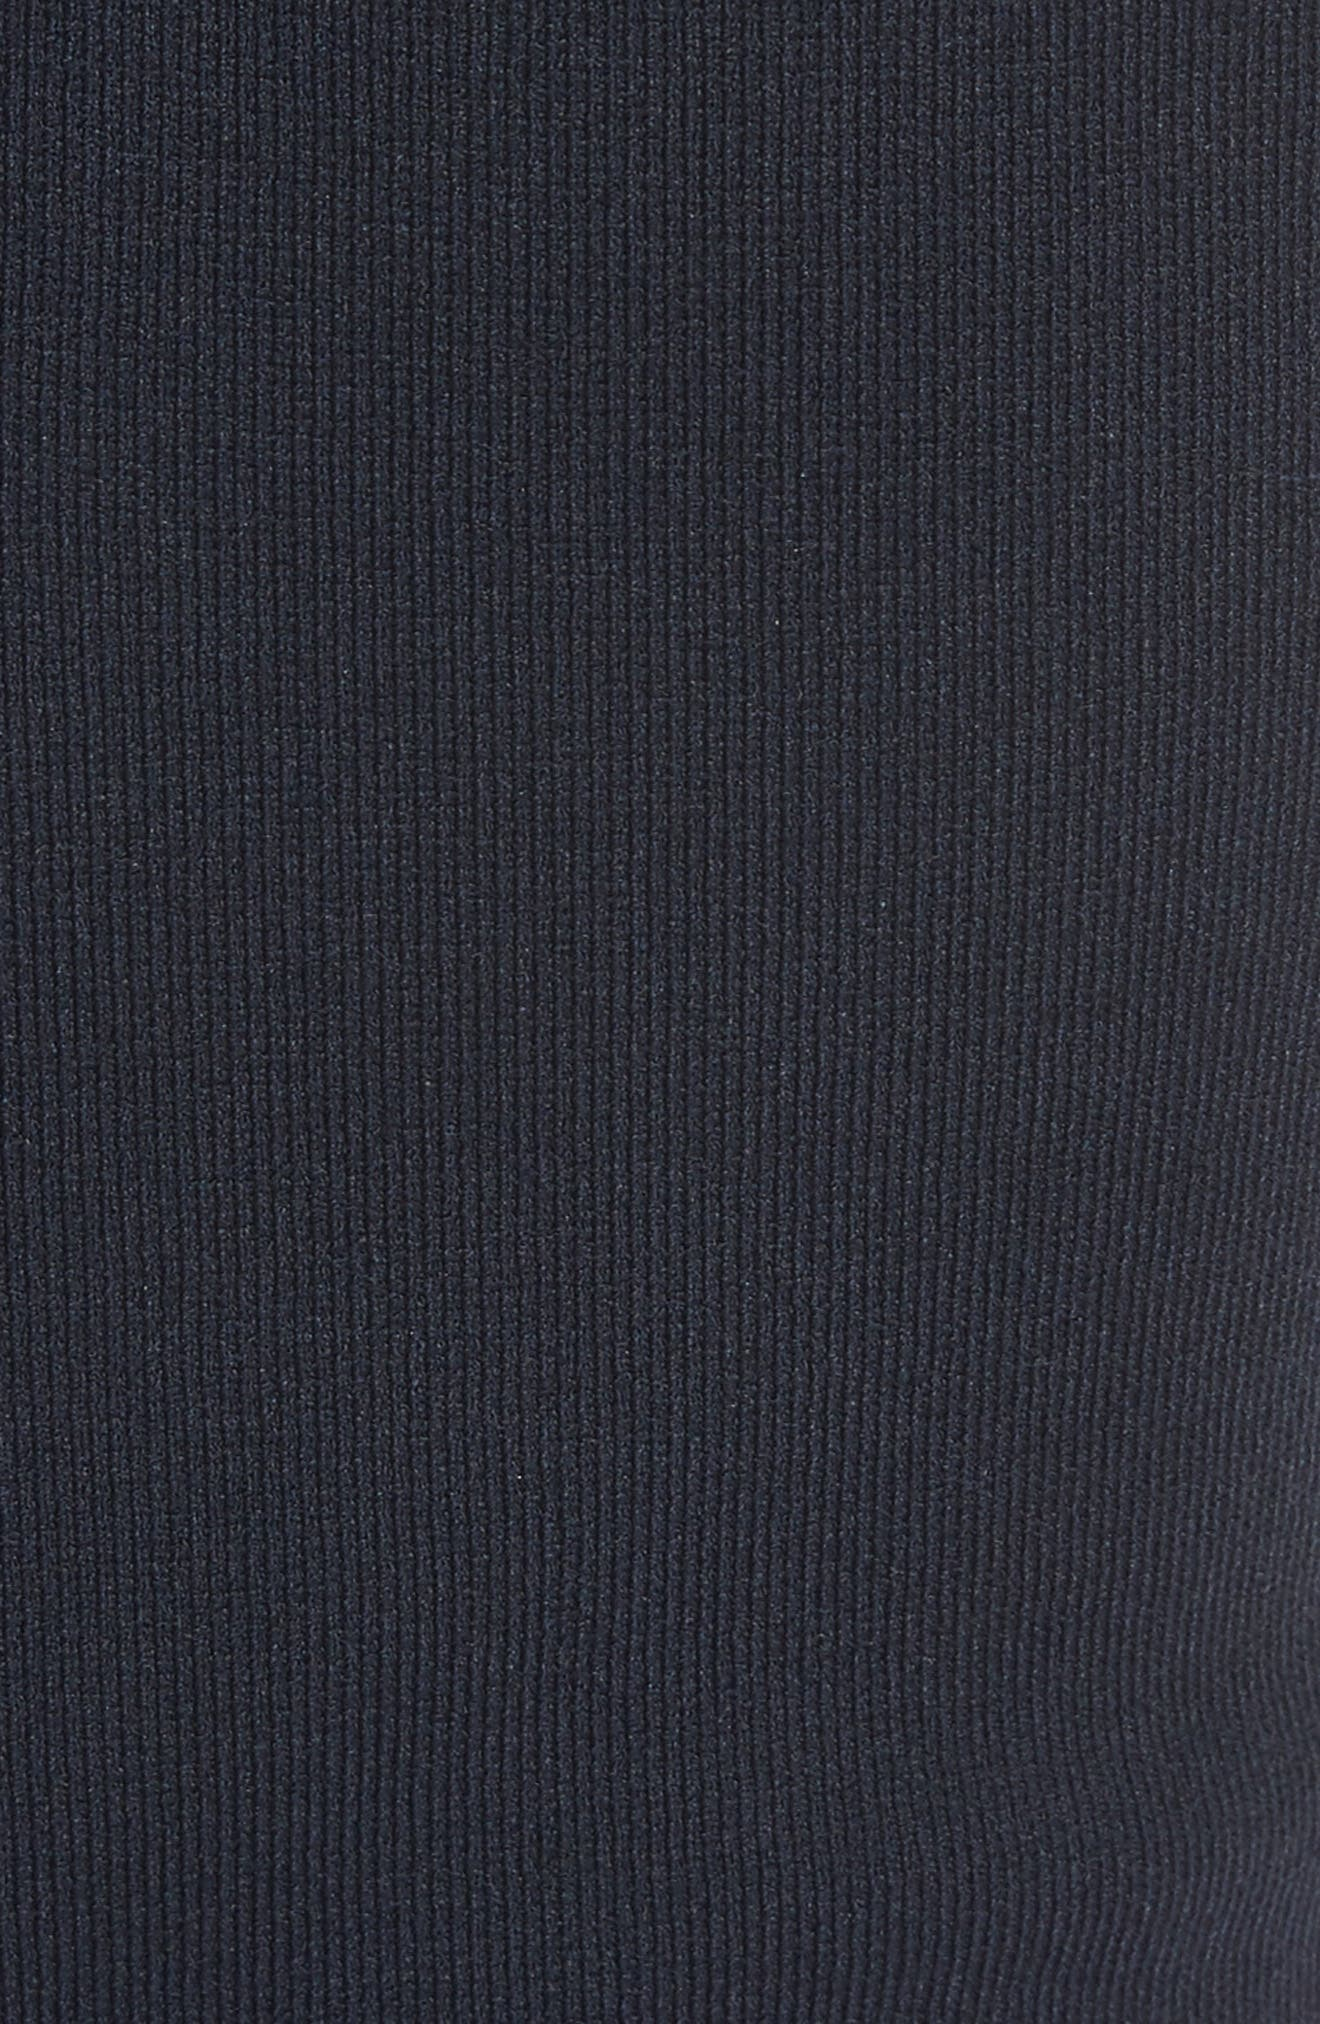 Woven Trim Fit & Flare Dress,                             Alternate thumbnail 5, color,                             Navy Multi